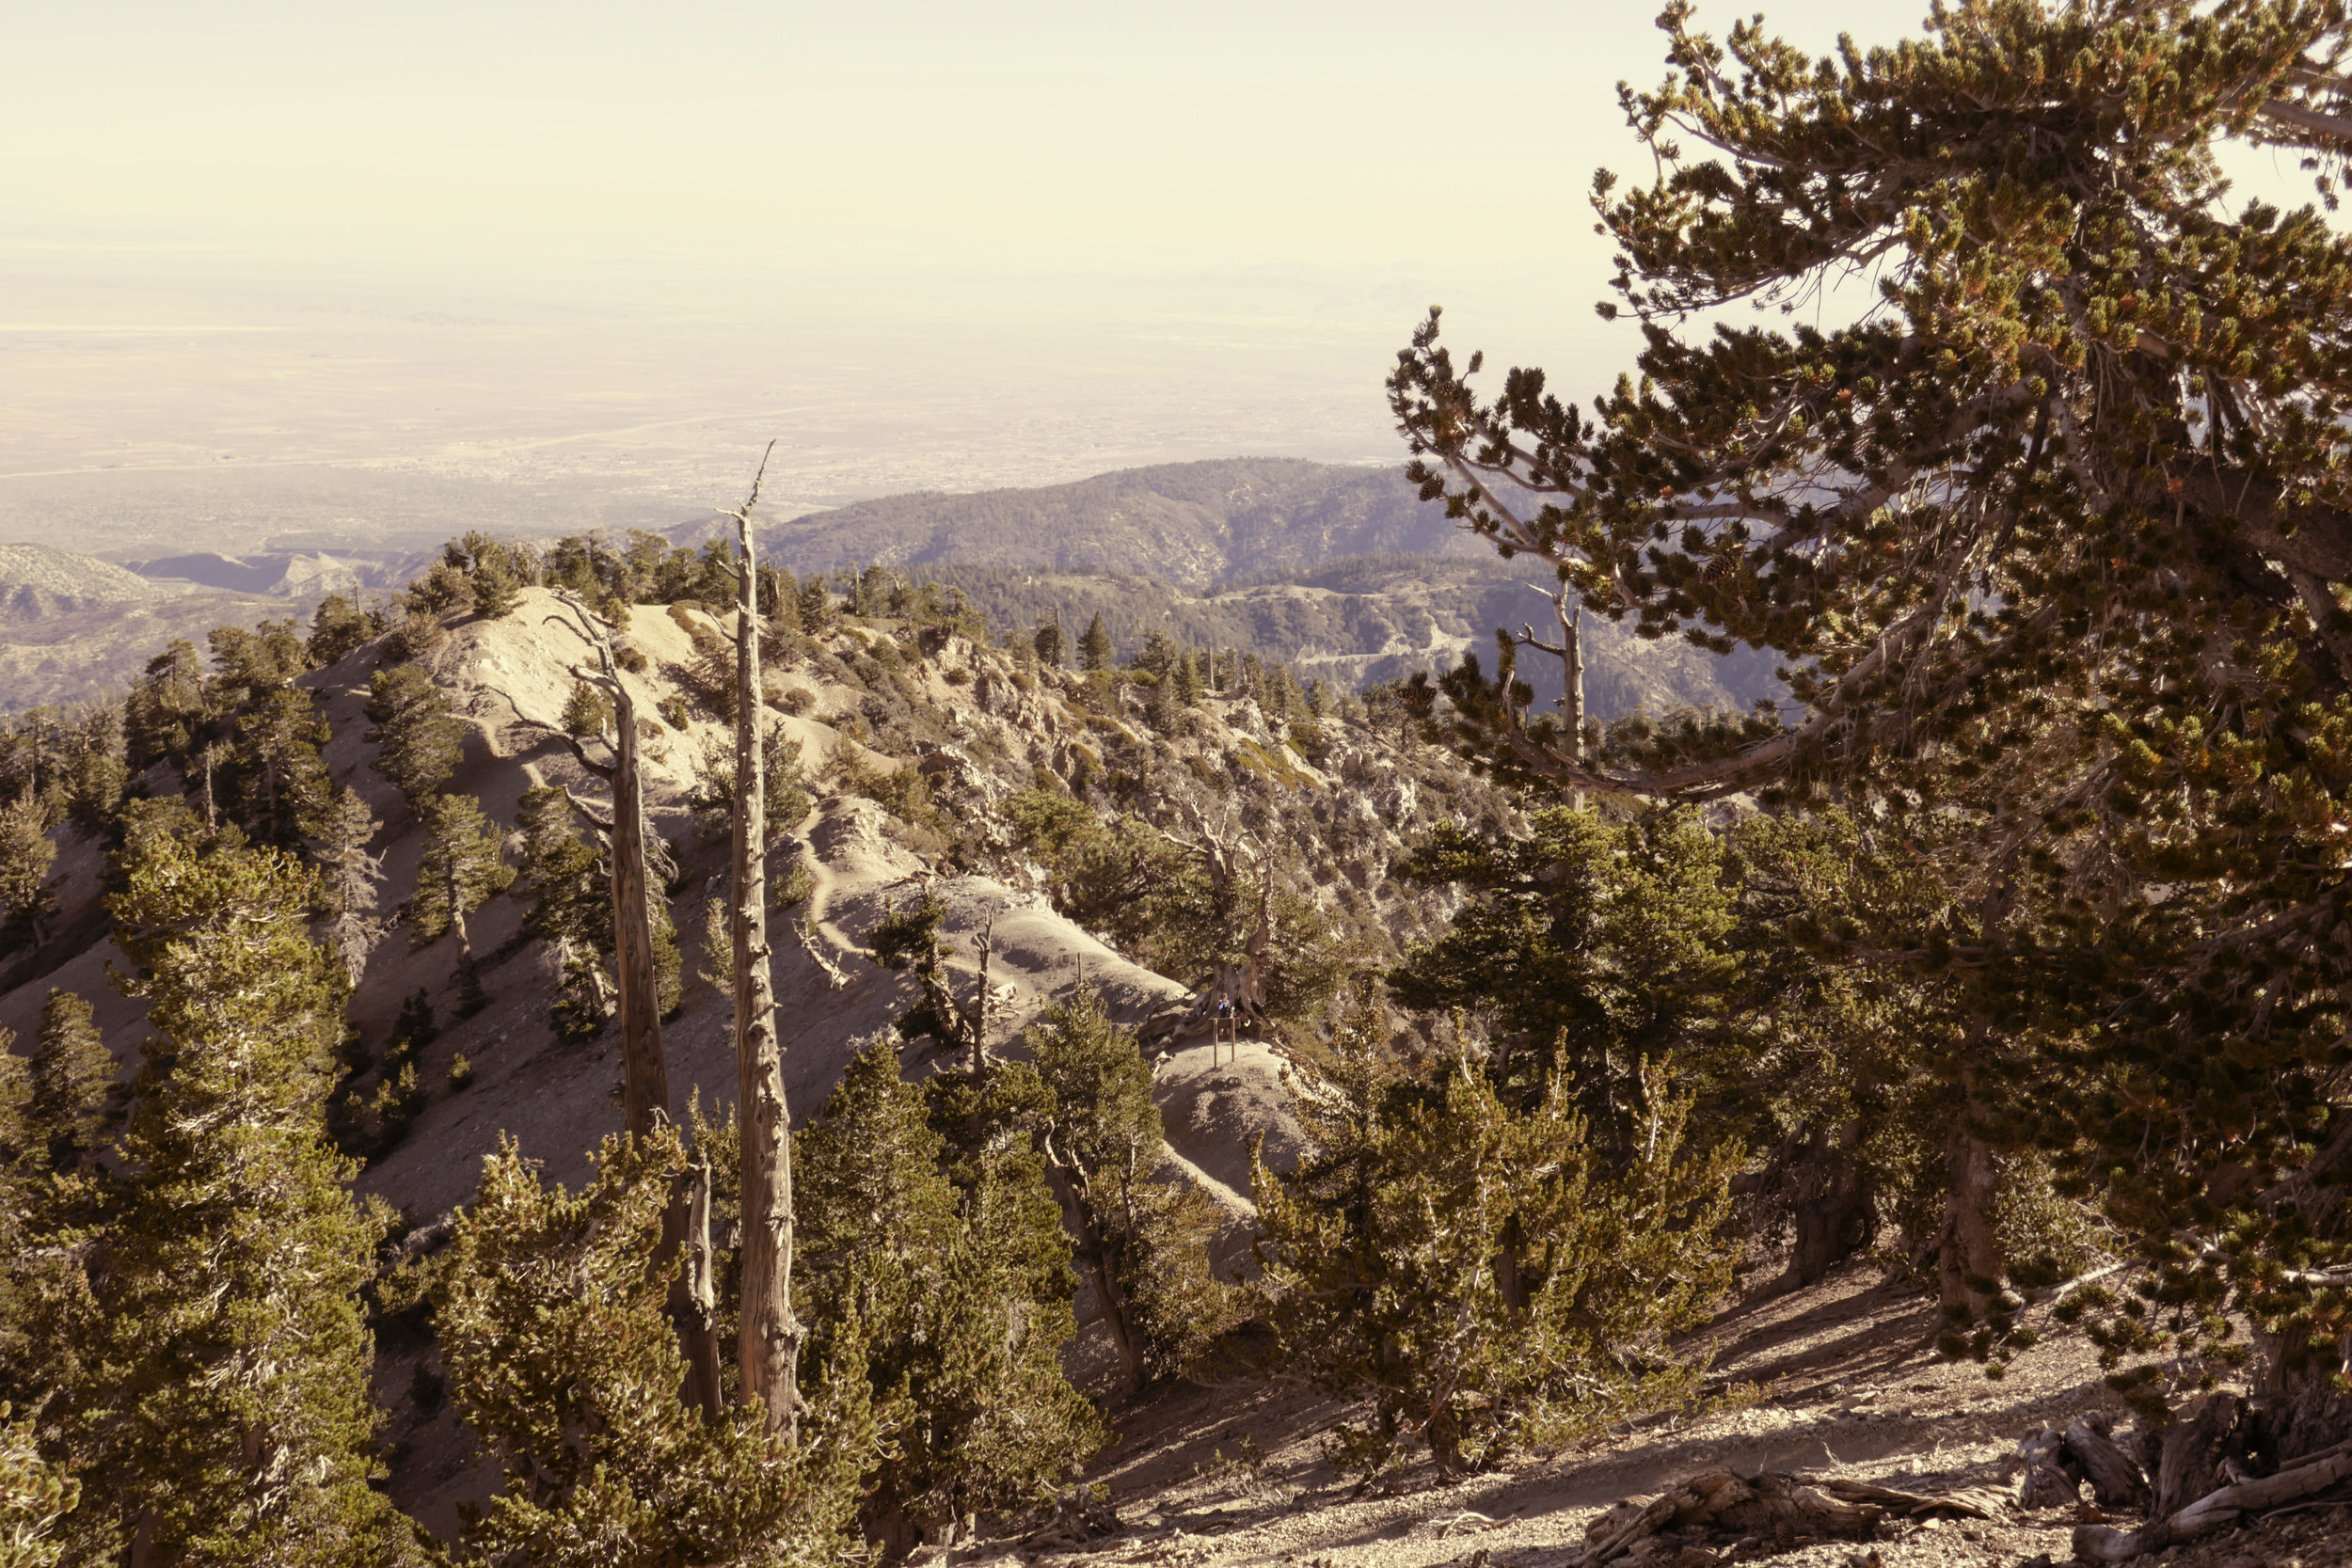 Closer view of the ridge.